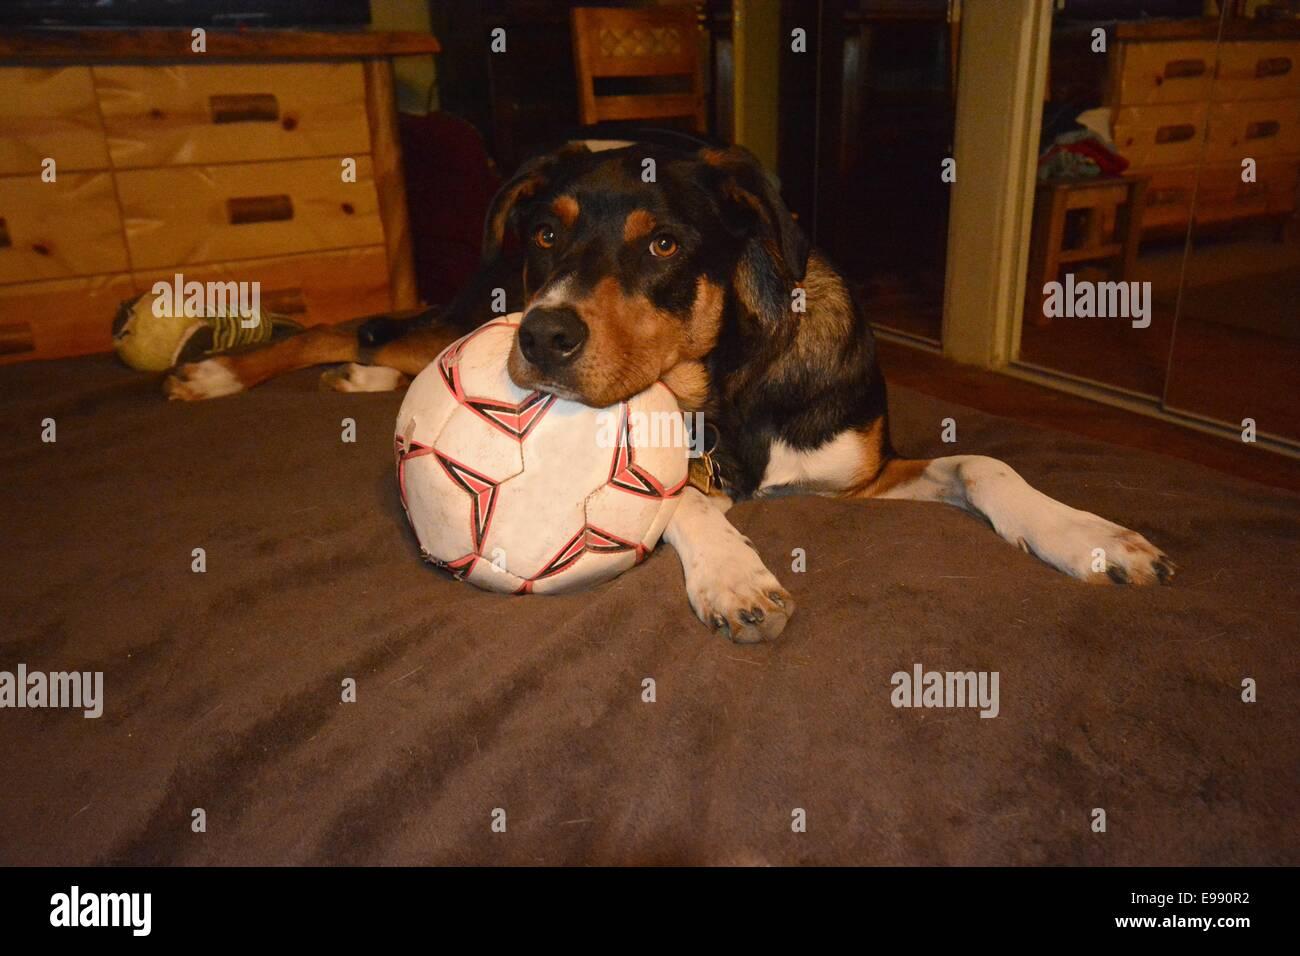 Dog dozing on his soccer ball. - Stock Image